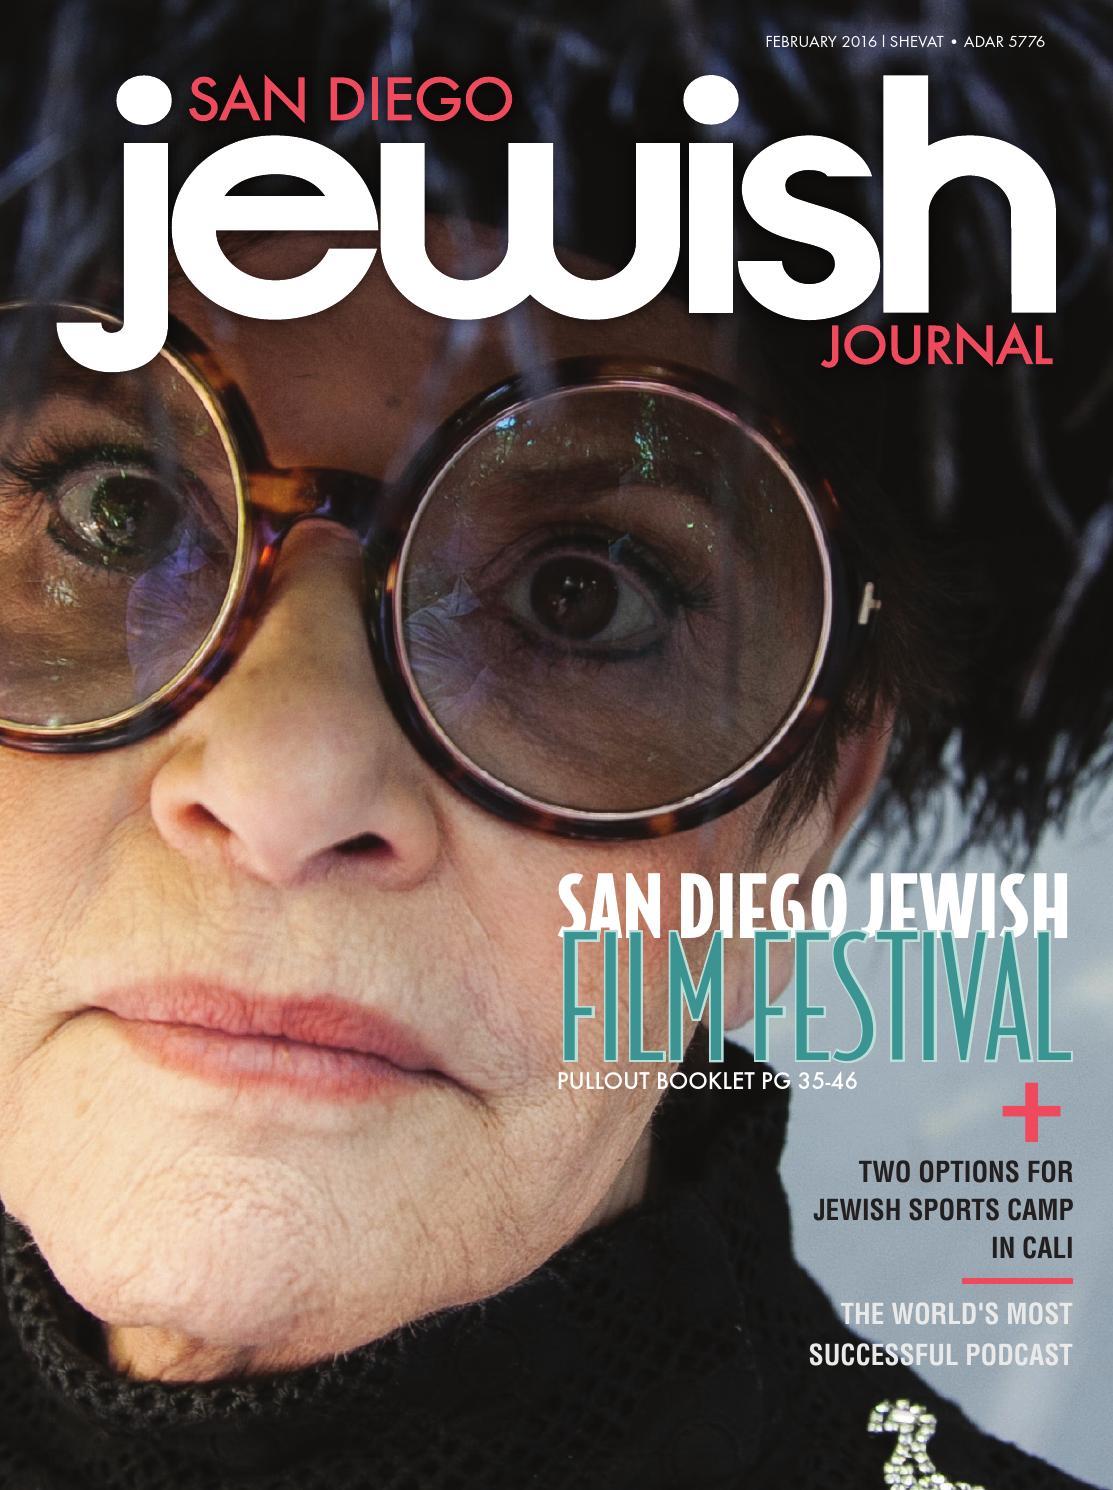 fe279fc558 San Diego Jewish Journal February 2016 by San Diego Jewish Journal - issuu